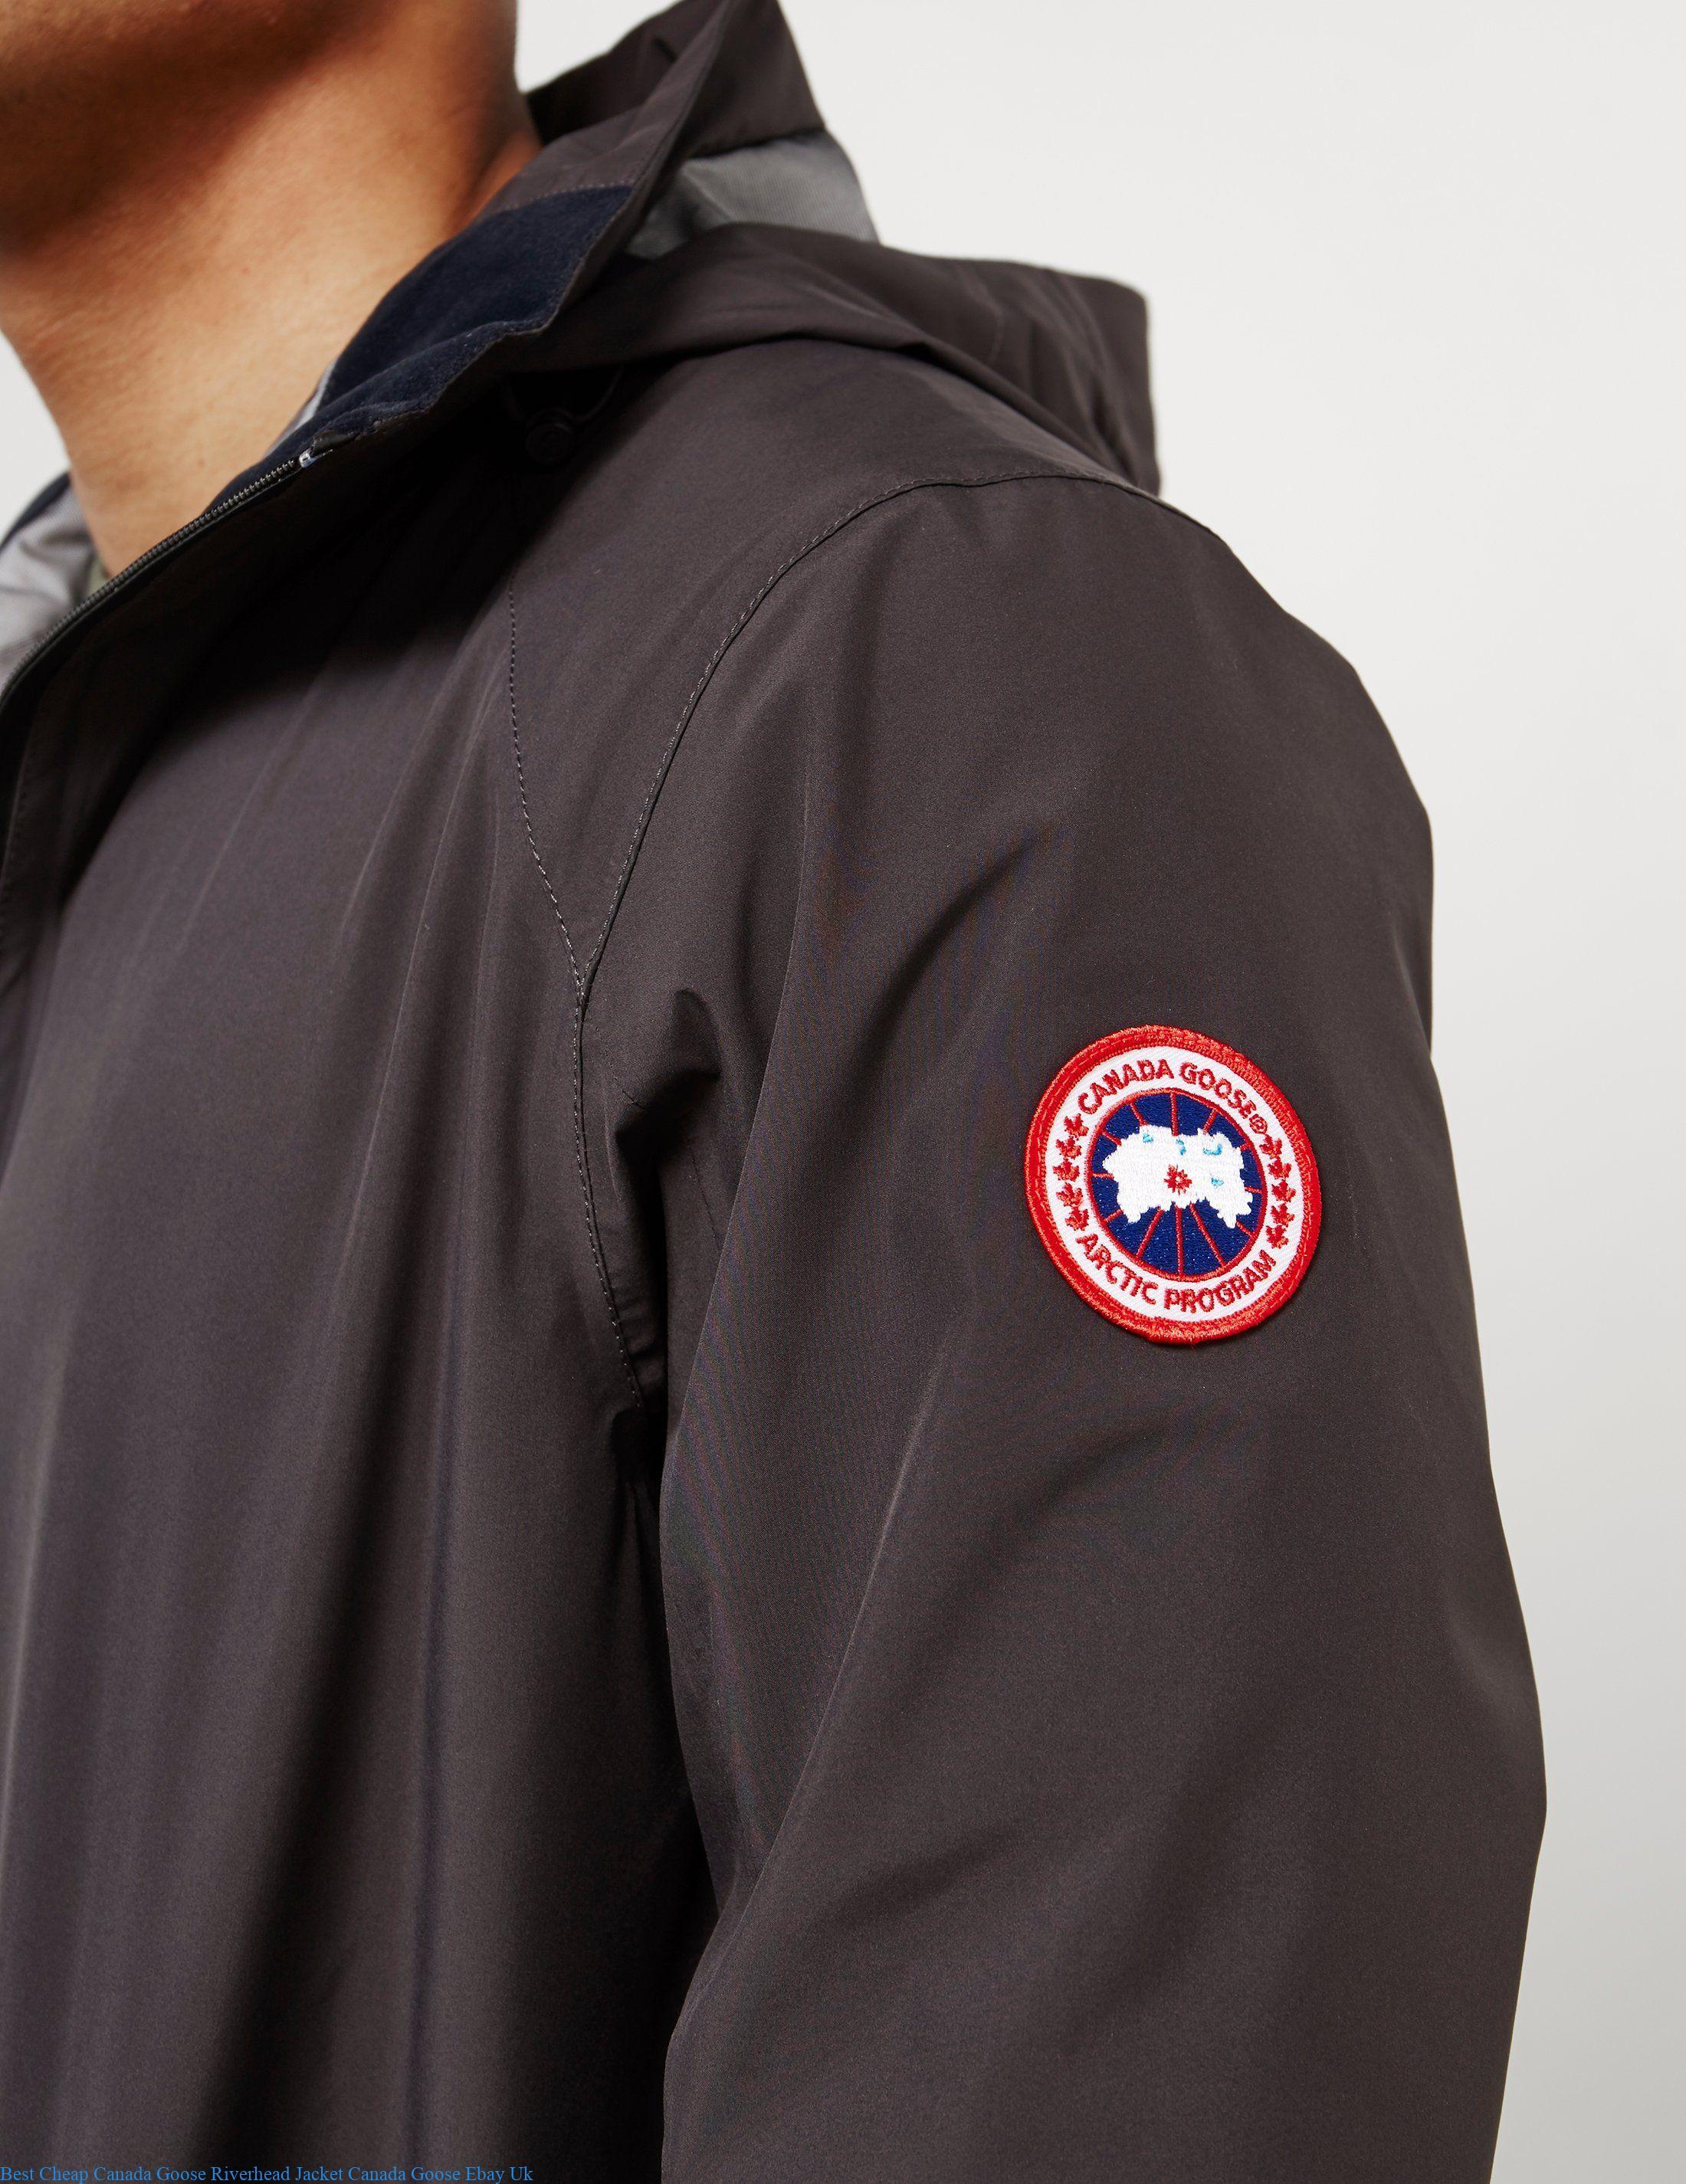 Canada Goose Ebay >> Best Cheap Canada Goose Riverhead Jacket Canada Goose Ebay Uk